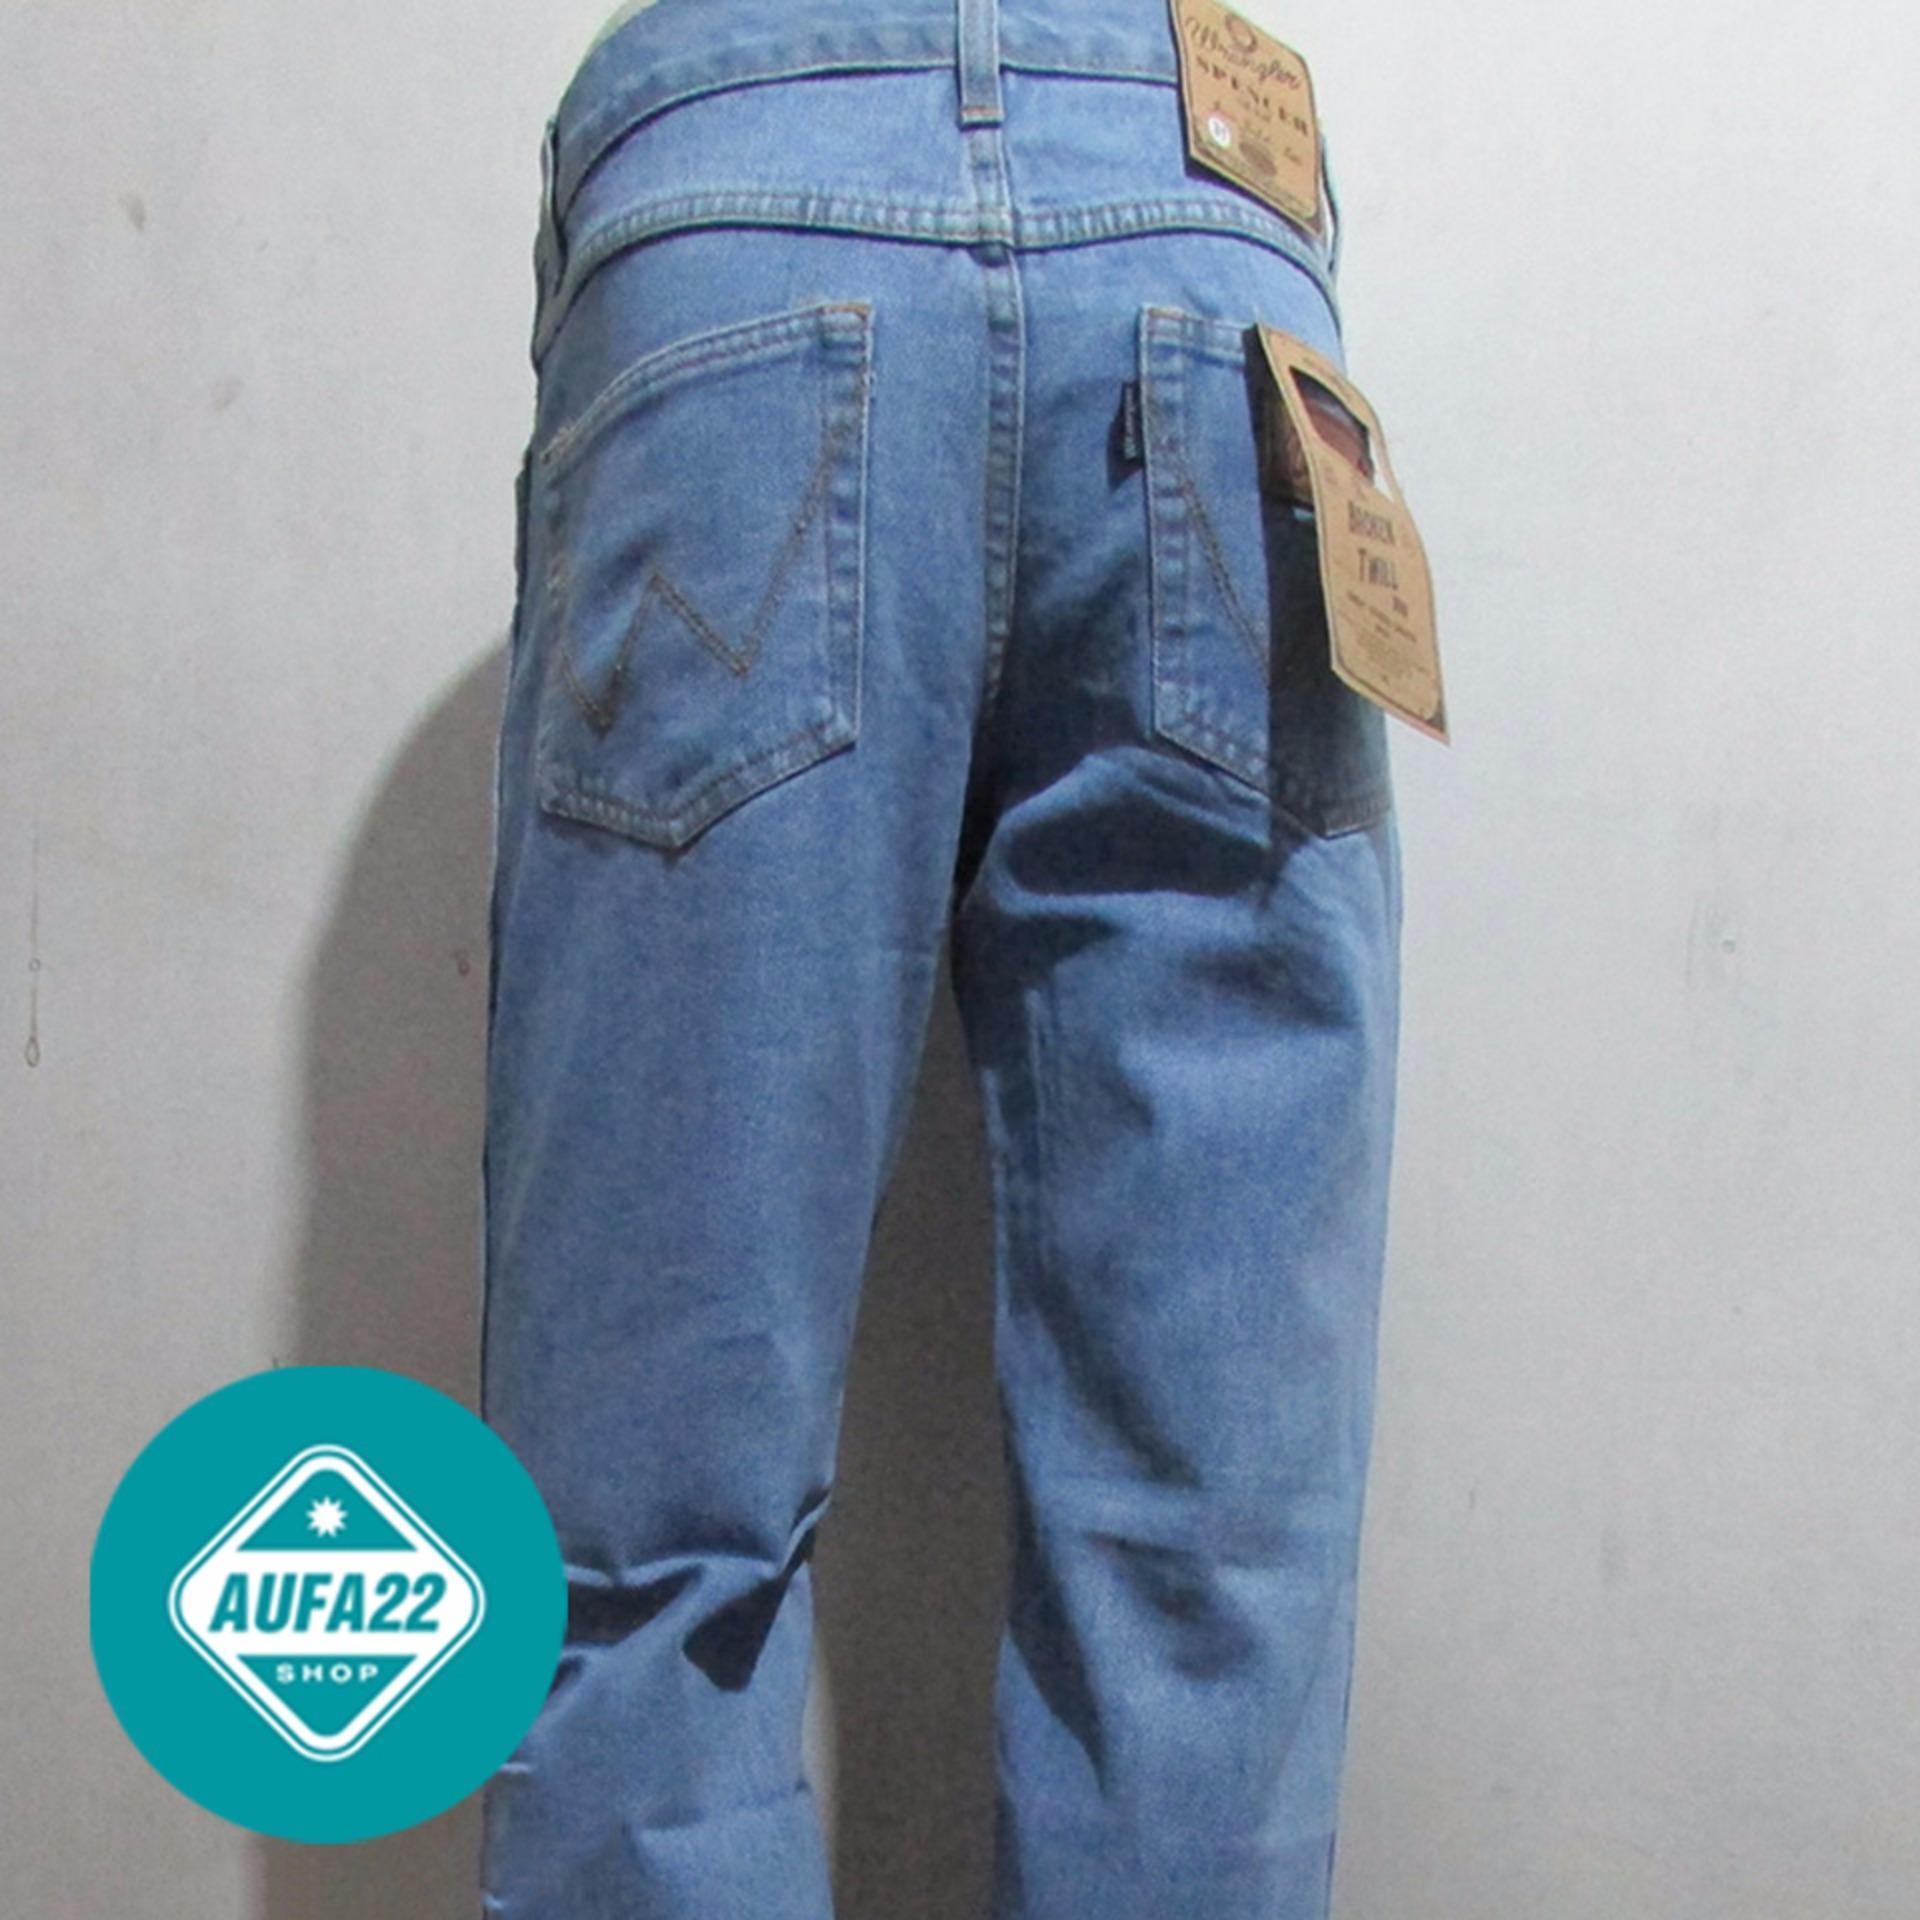 Celana Jeans WRANGLER Bioblitz-Biru Muda Original Regular Standar Promo Murah